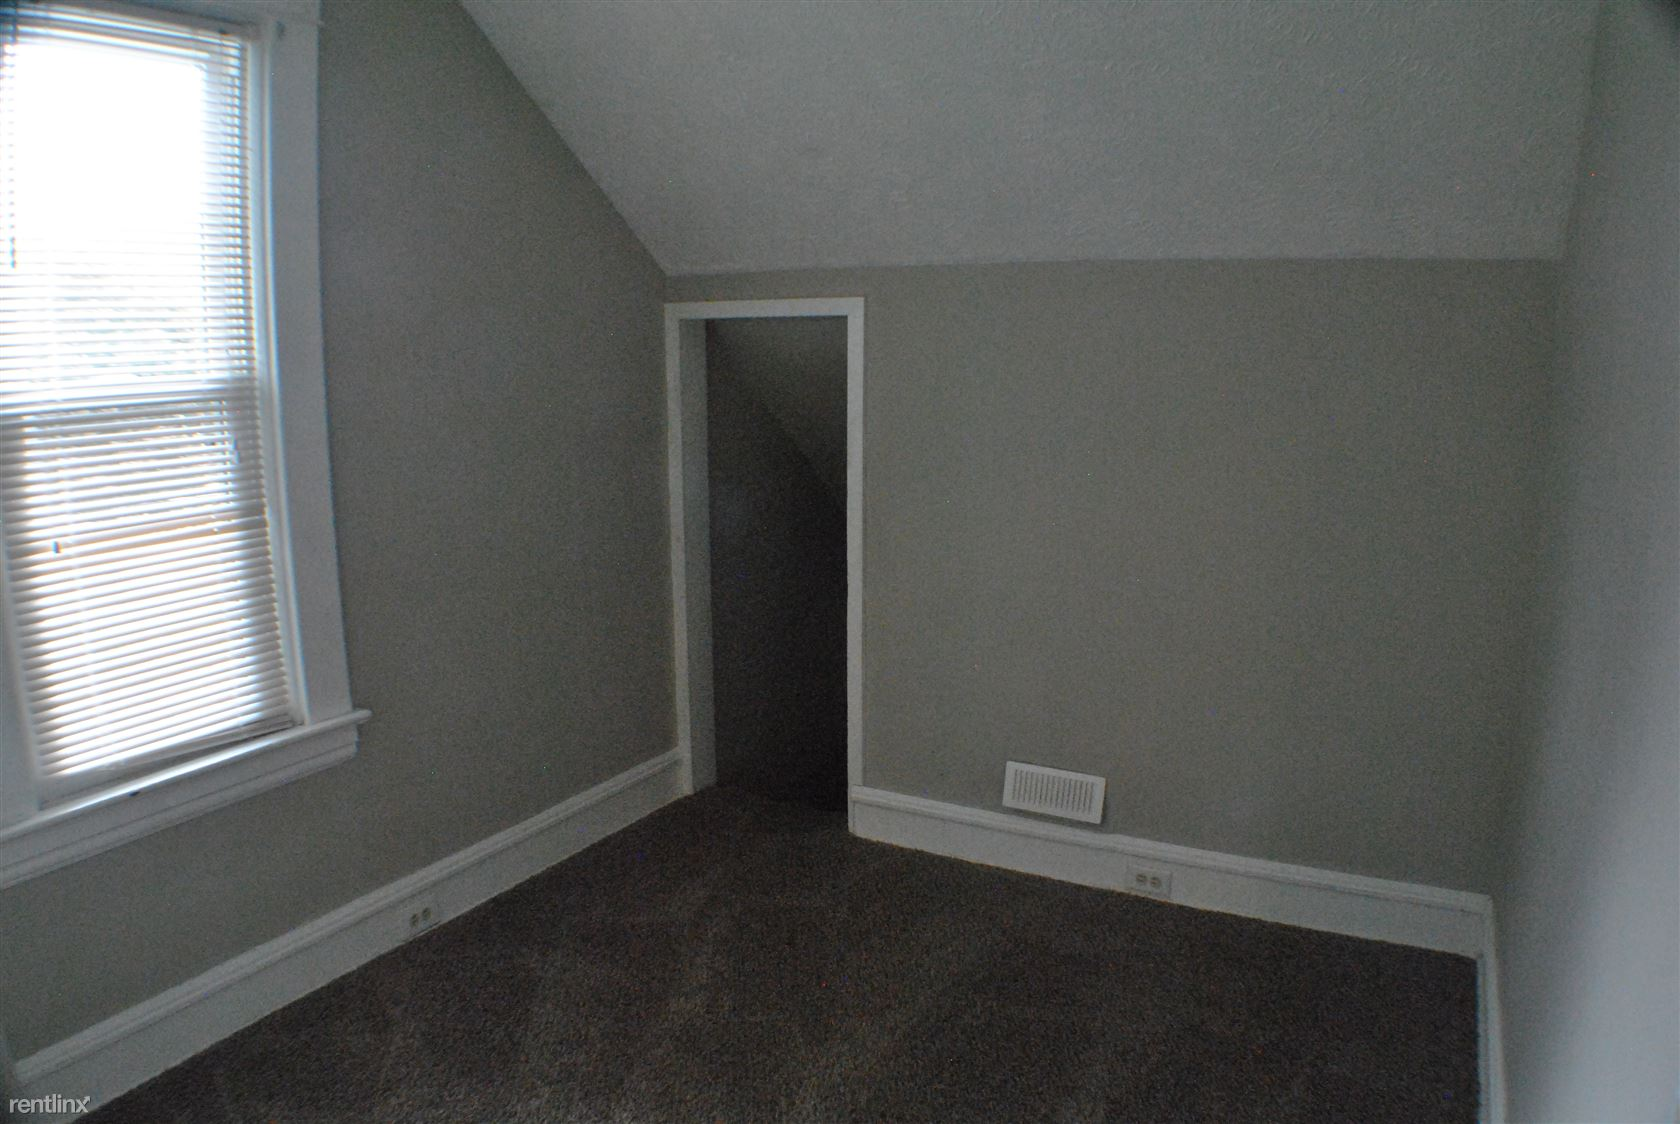 1050 Thomas - Bedroom #1